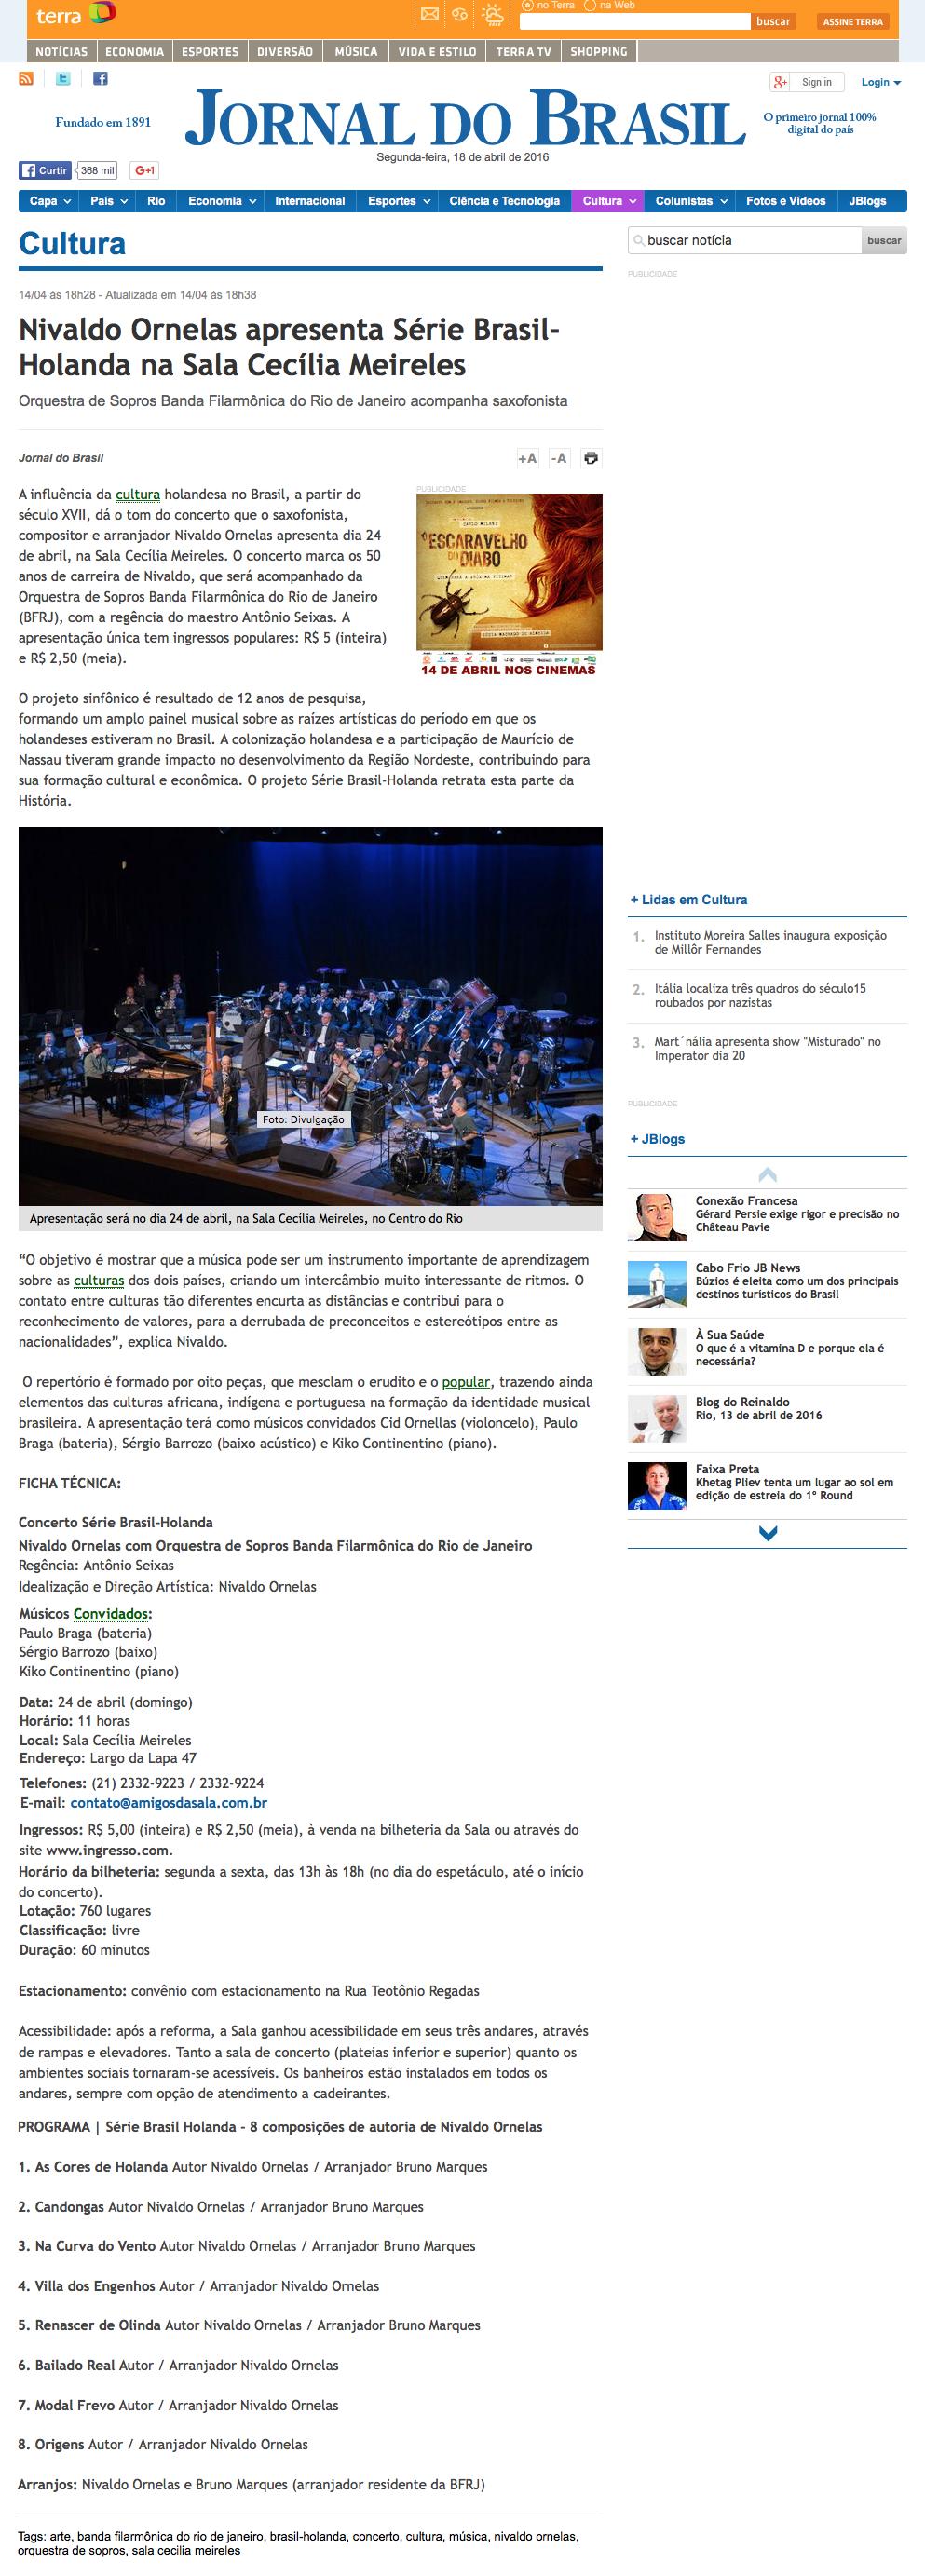 Materia Jornal do Brasil